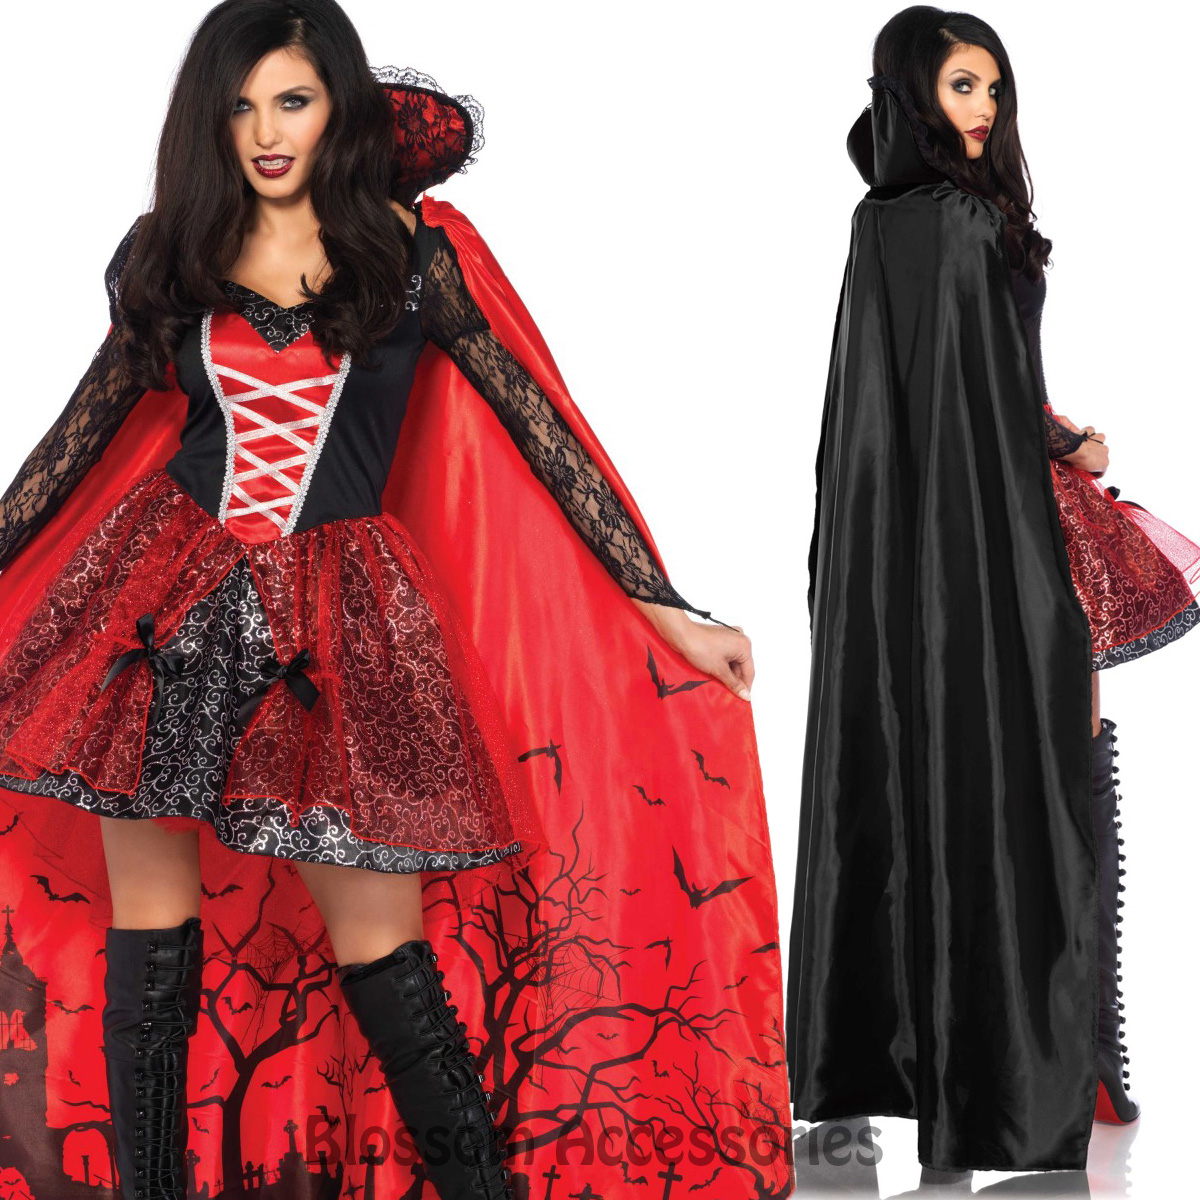 CA73 Leg Avenue Vampire Temptress Dracula Goth Gown Halloween Dress ...